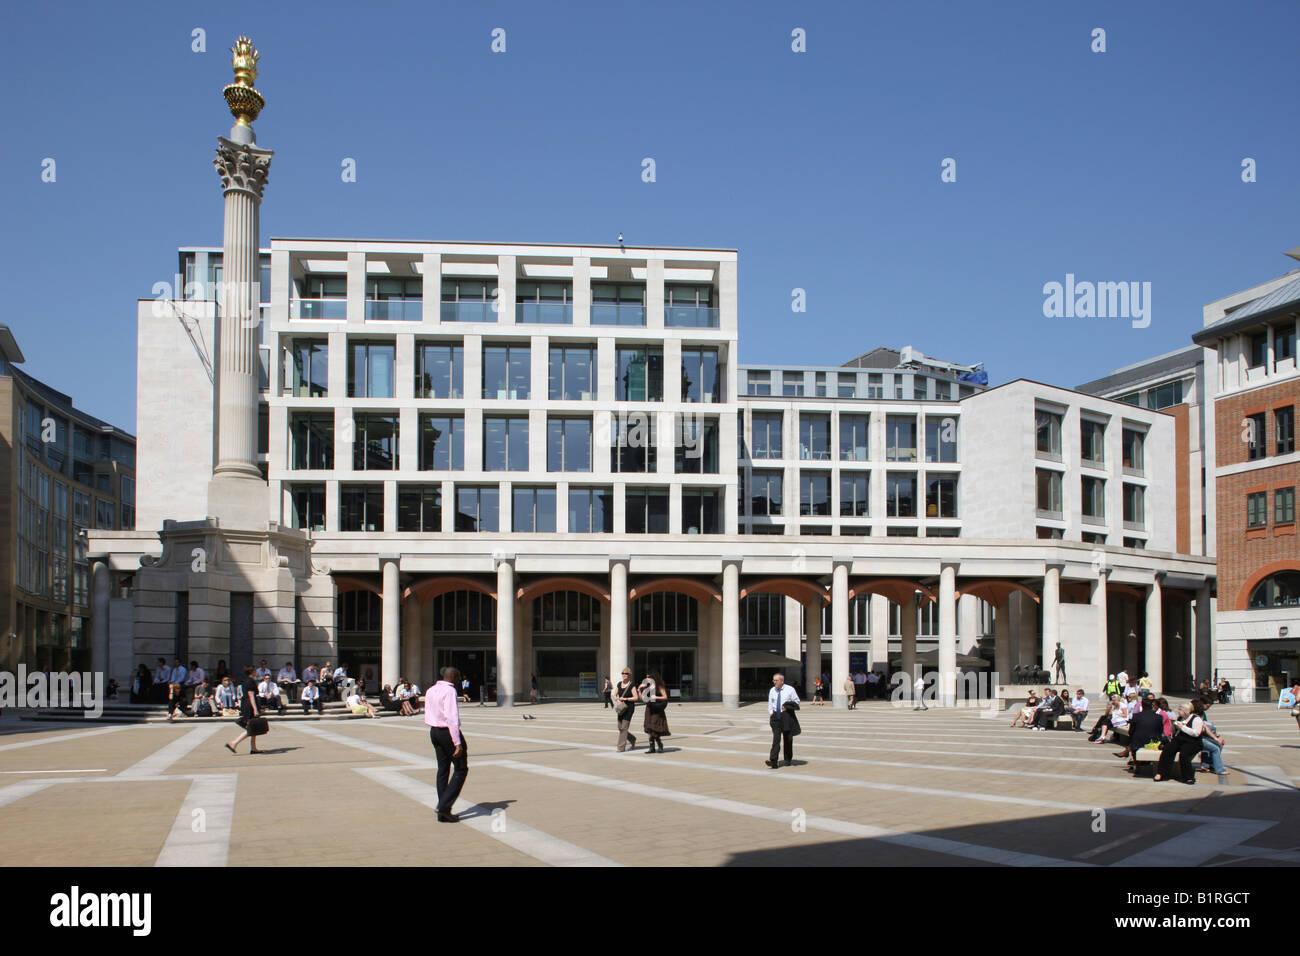 London Stock Exchange, London, England, Great Britain, Europe - Stock Image